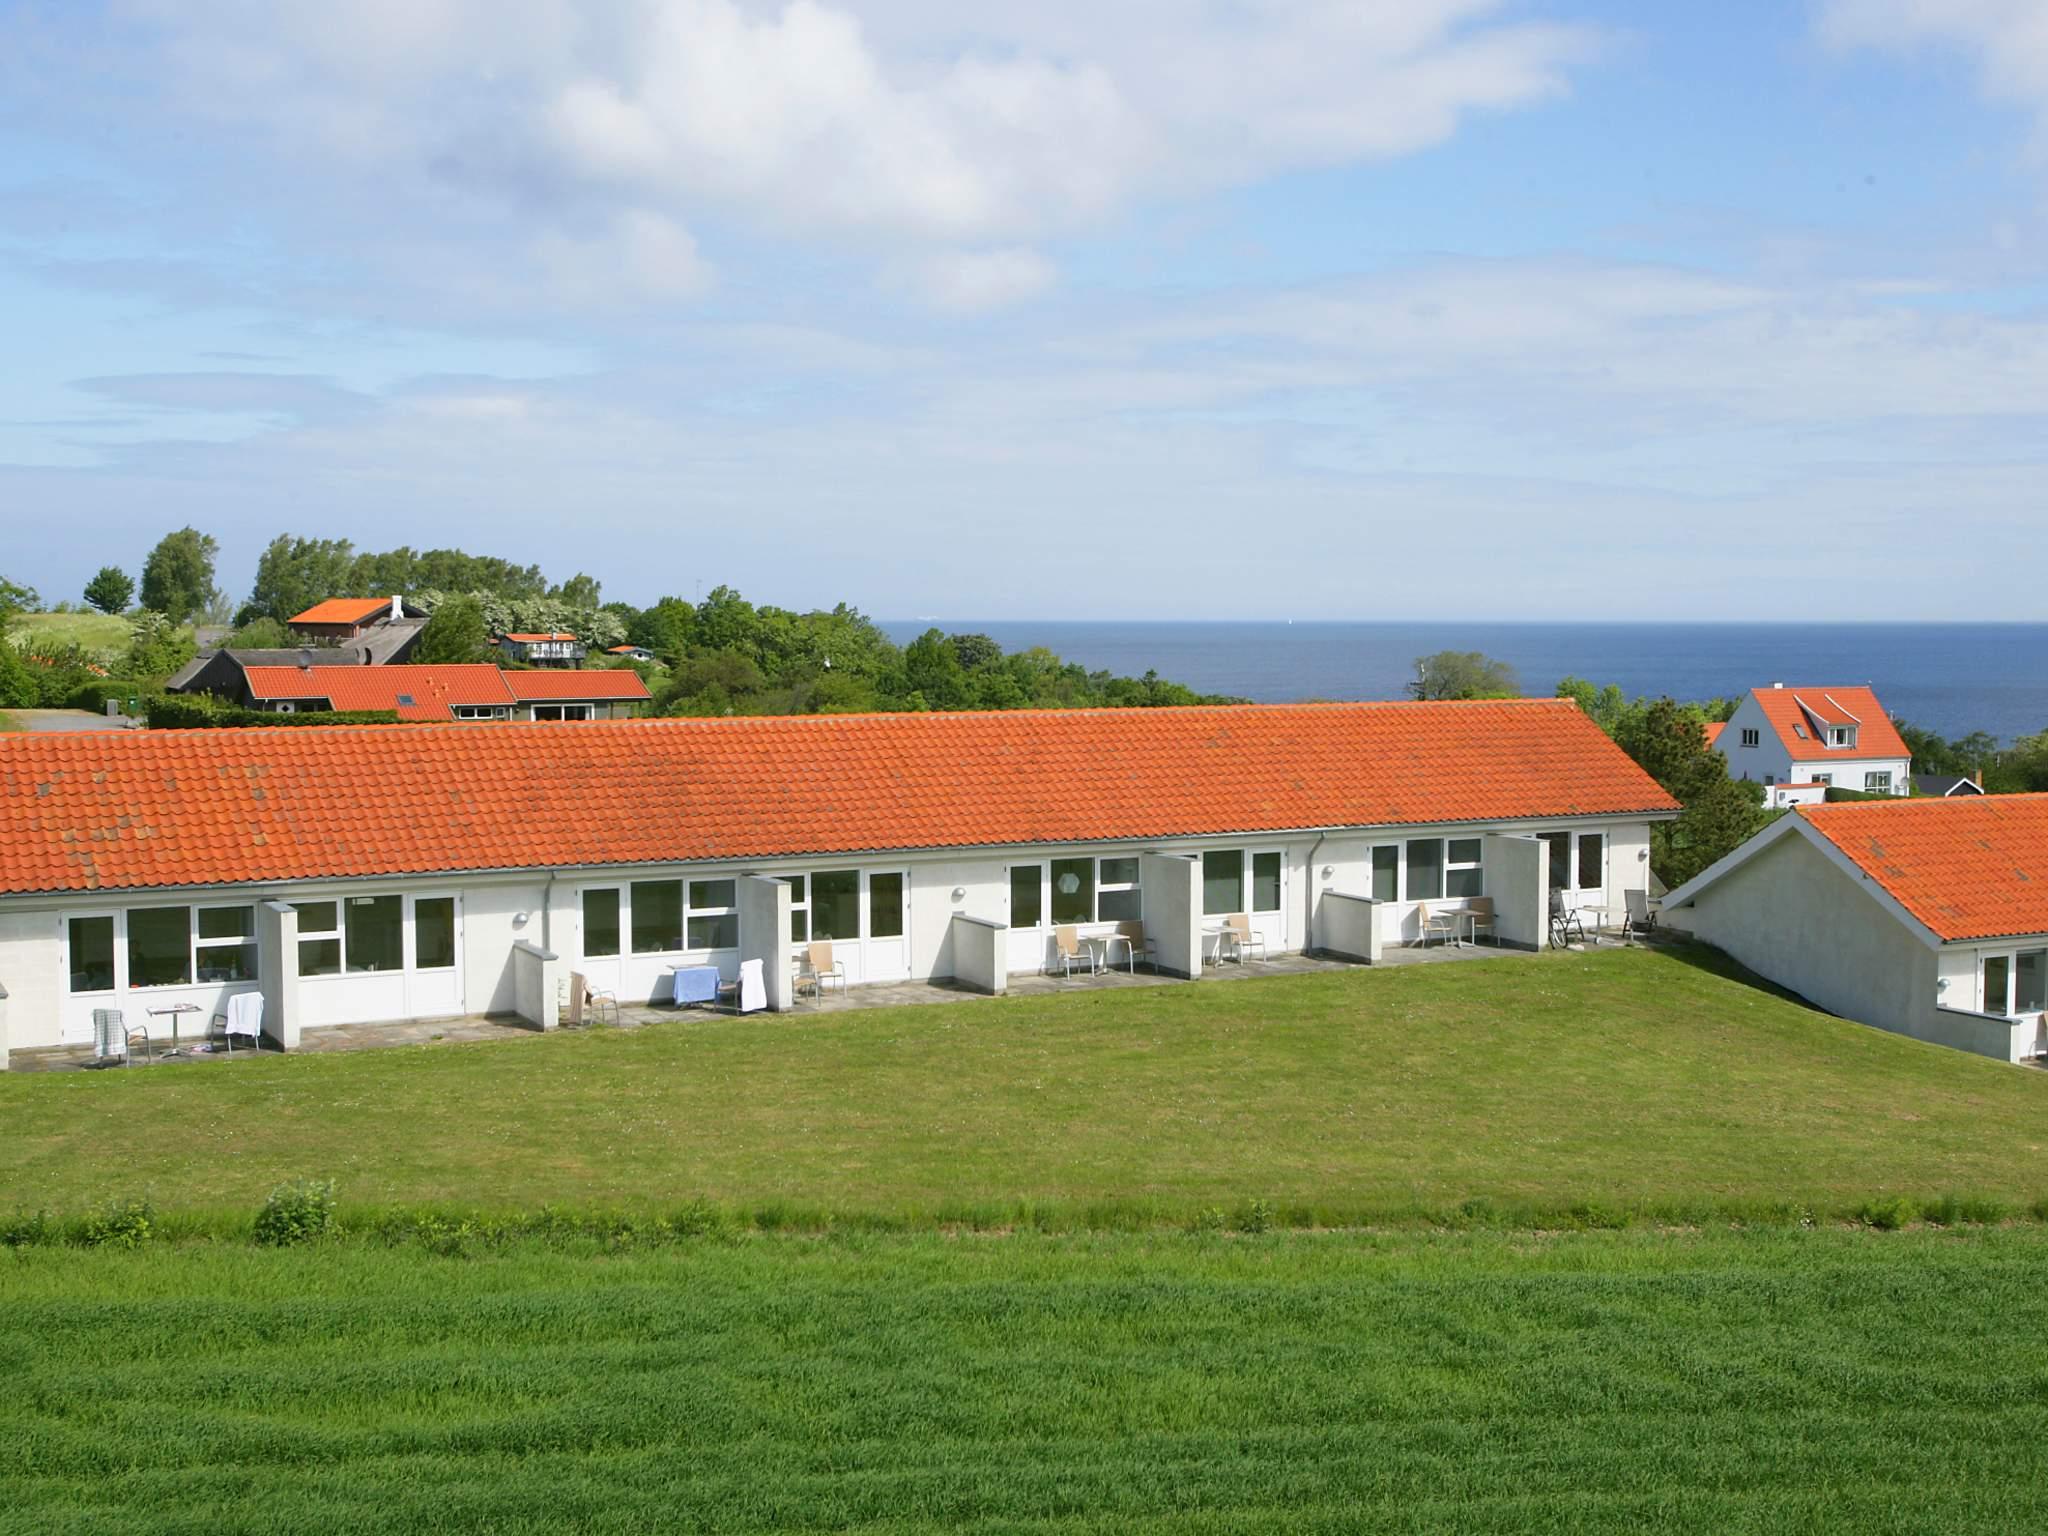 Ferienwohnung Sandkås (257108), Sandkås, , Bornholm, Dänemark, Bild 9